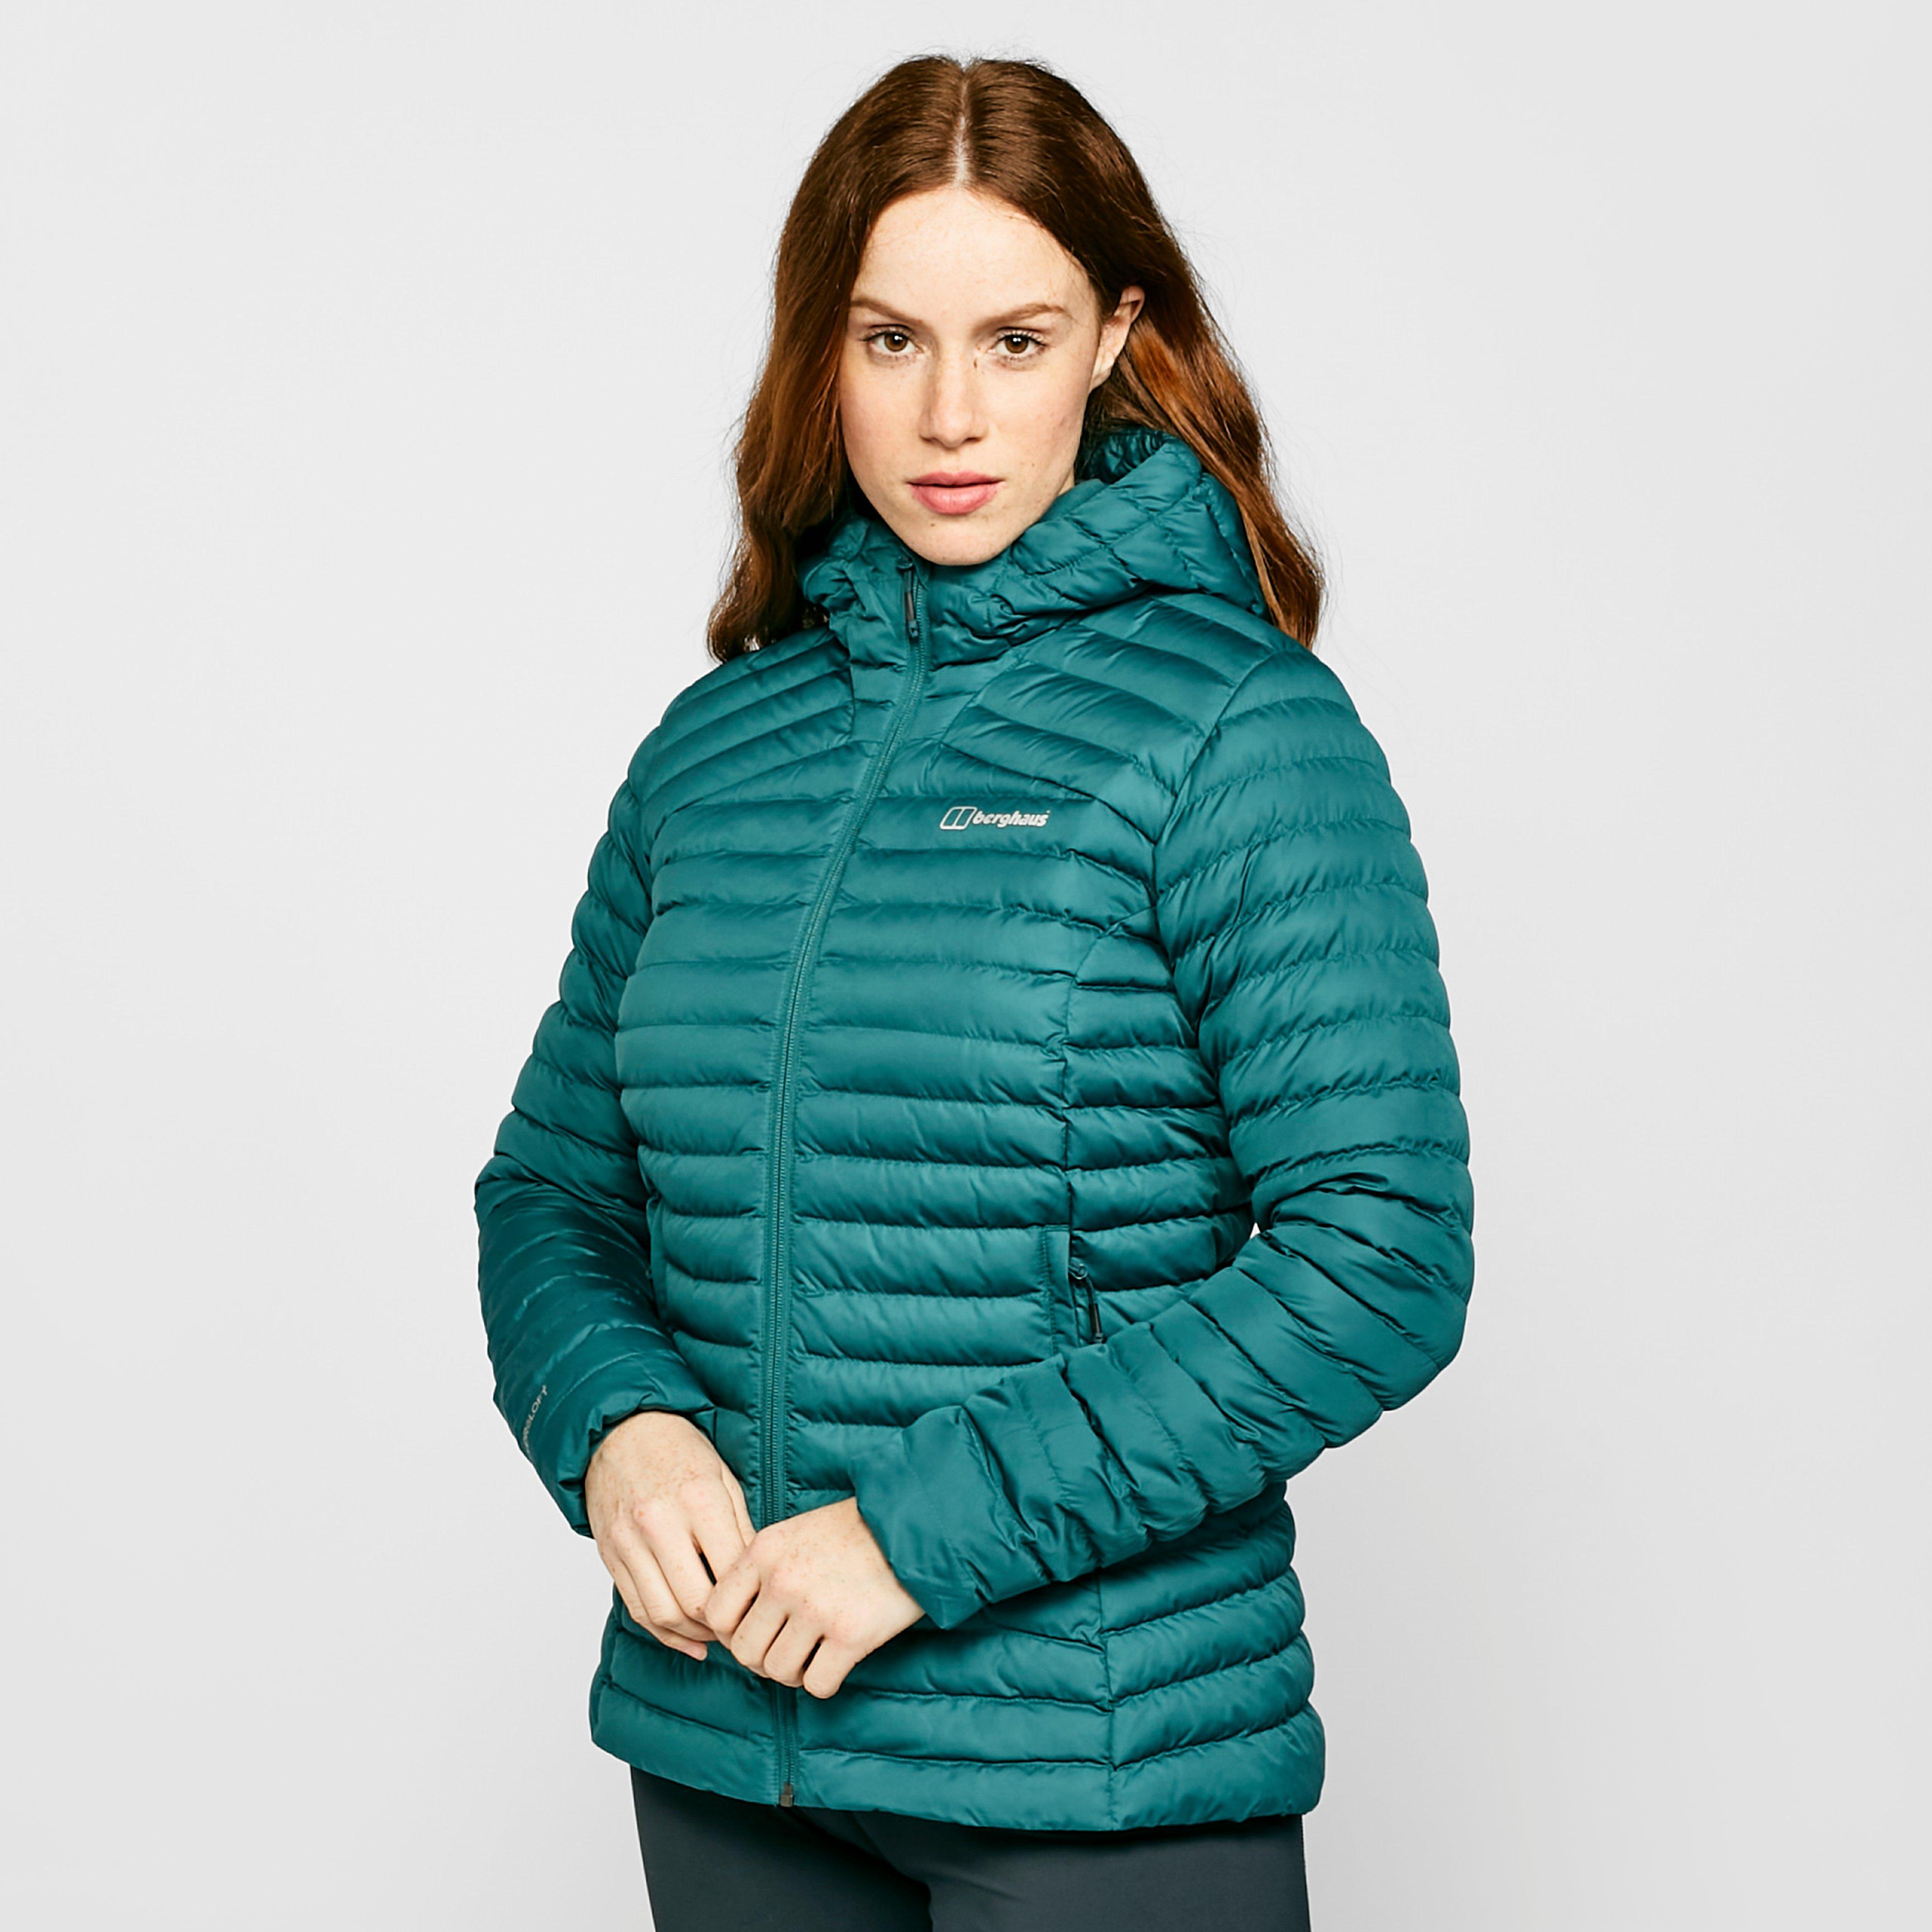 Berghaus Womens Talmine Jacket - Blue/grn$  Blue/grn$